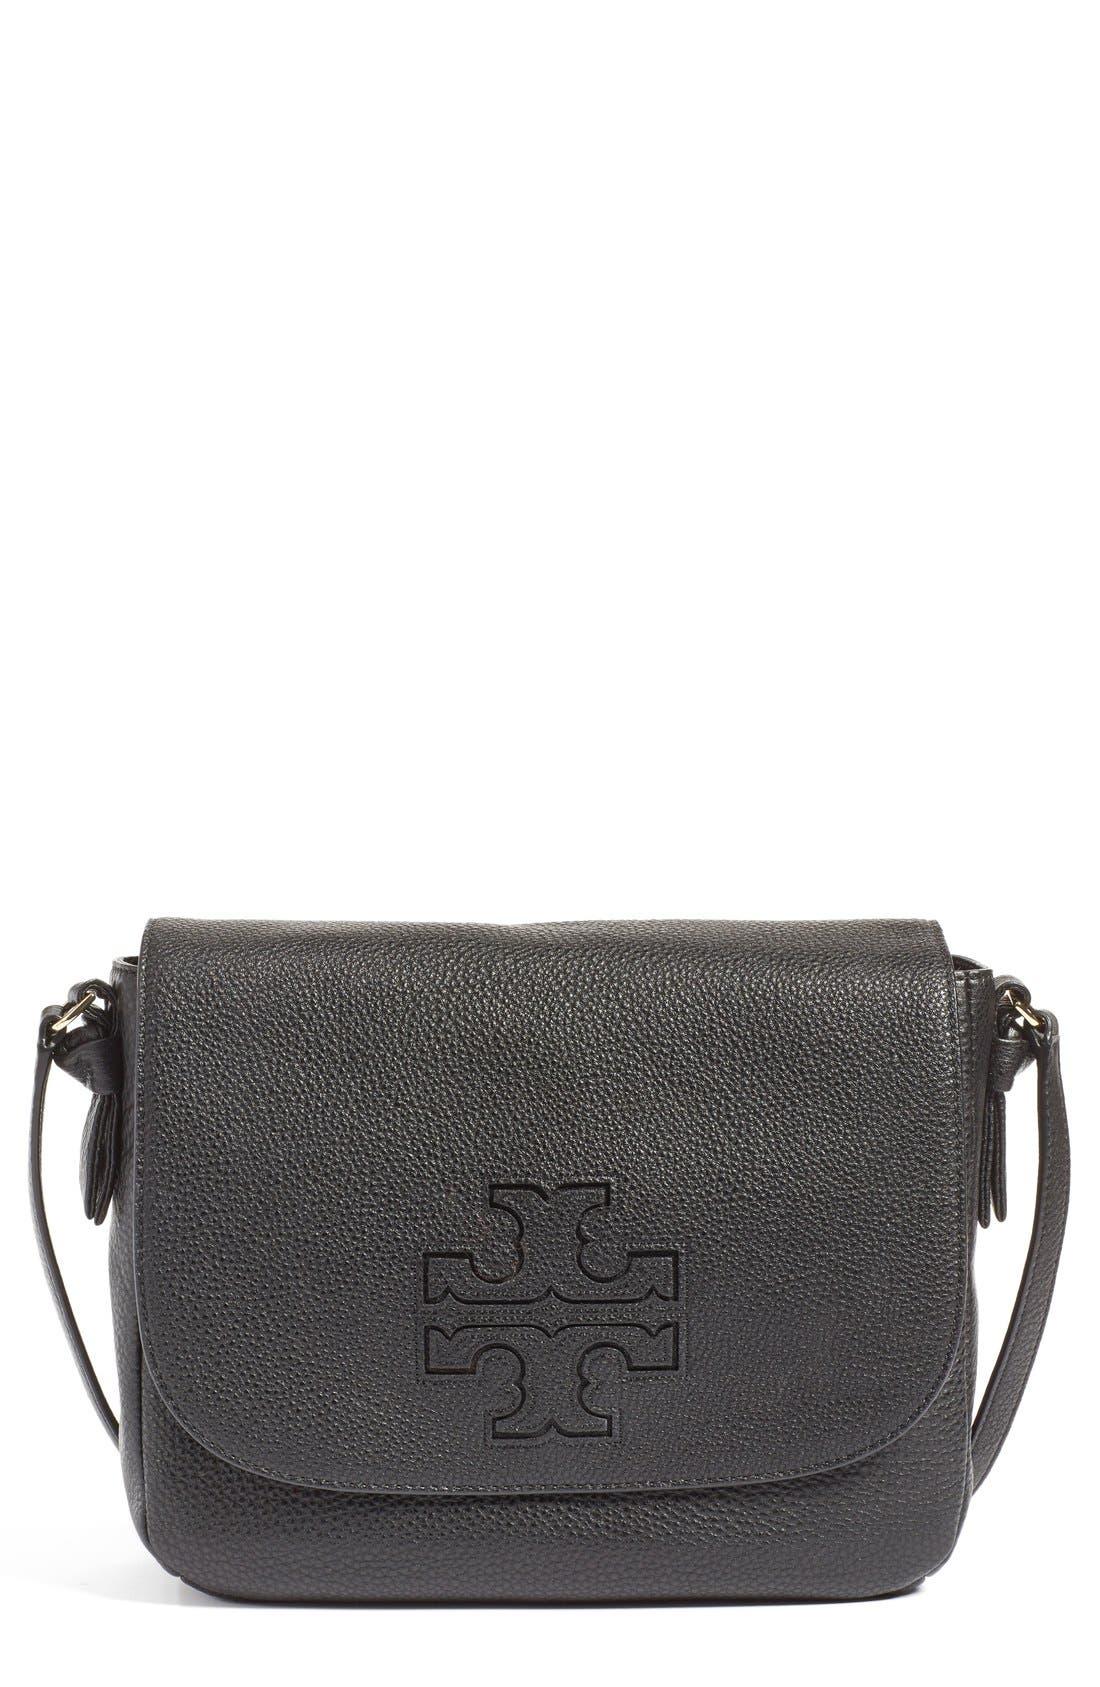 'Harper' Leather Crossbody Bag,                             Main thumbnail 1, color,                             012